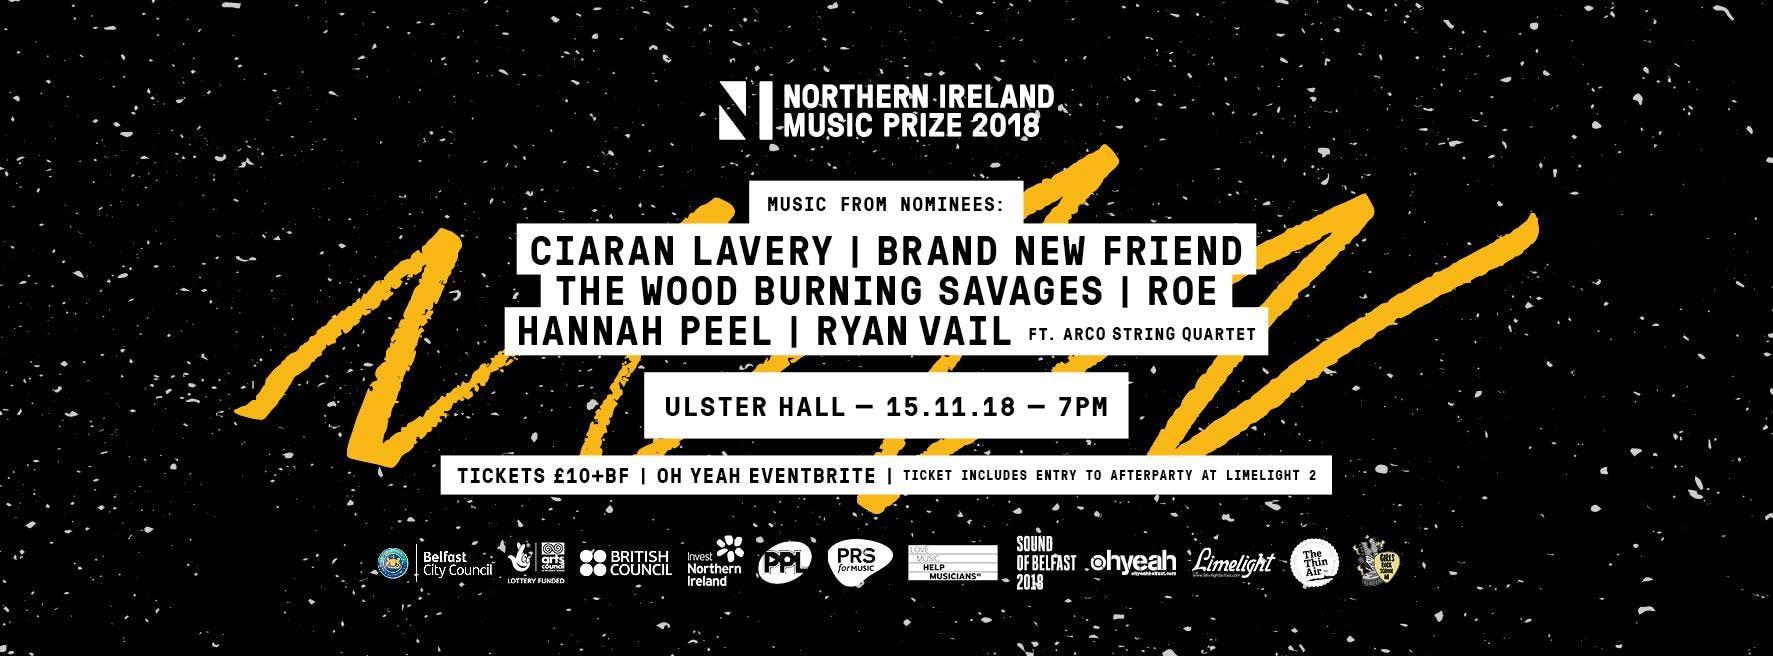 NI Music Prize 2018 - tinyurl.com/NIMPrize